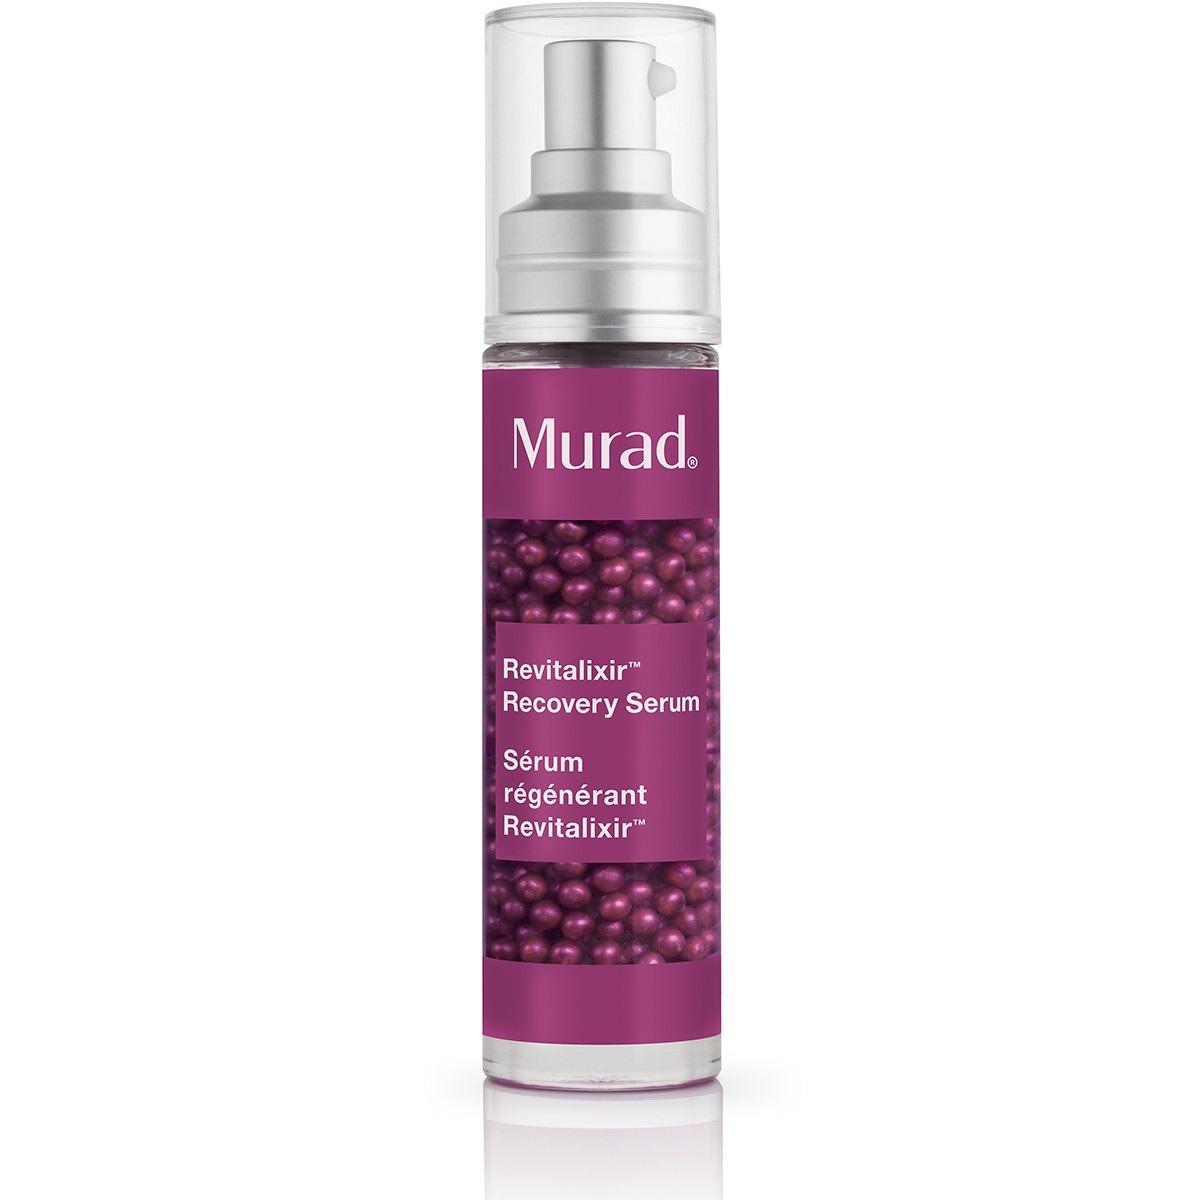 Murad Revitalixir™ Recovery Serum